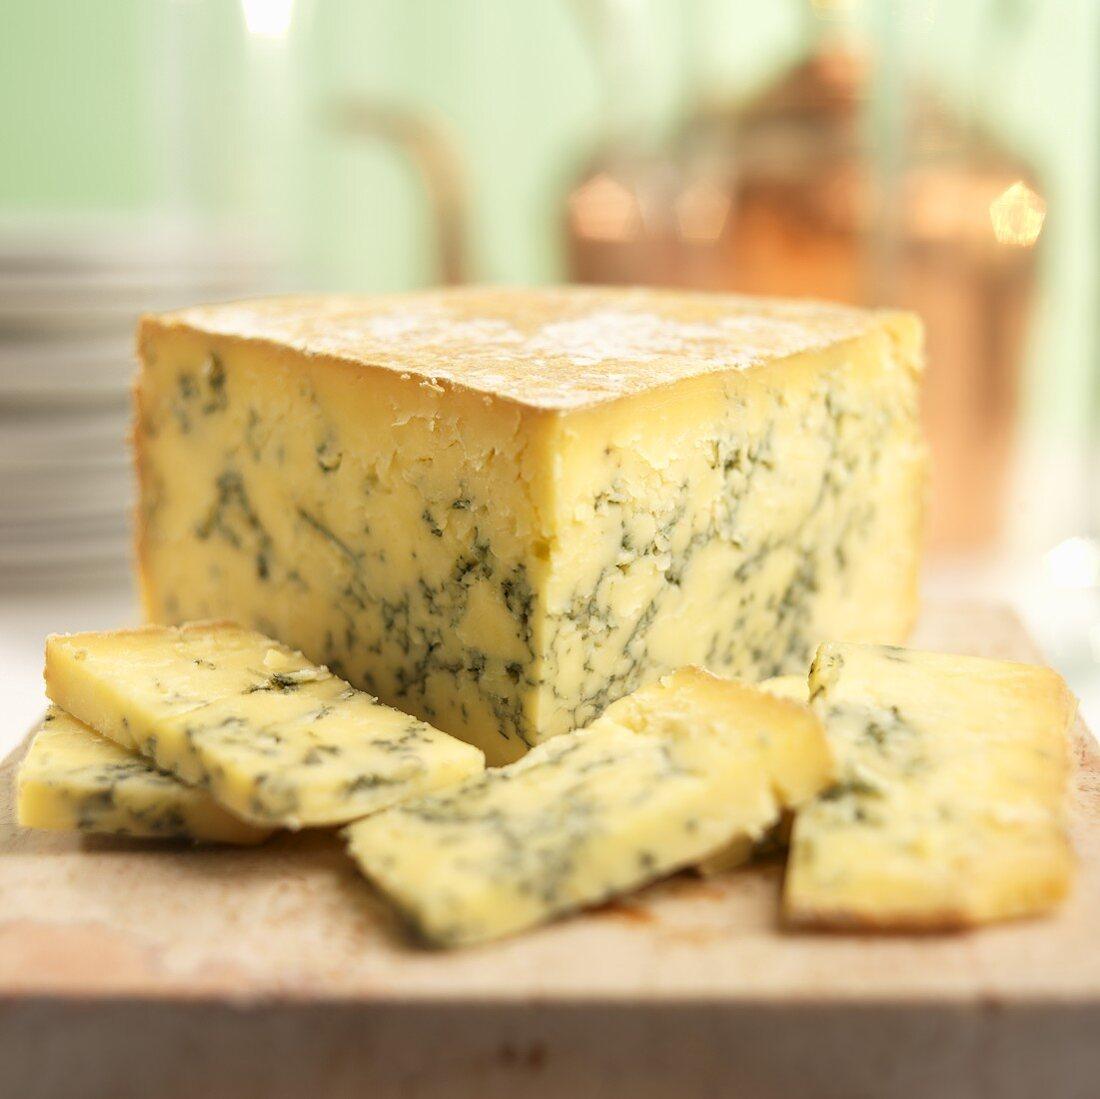 Sliced English Stilton Blue Cheese on Marble